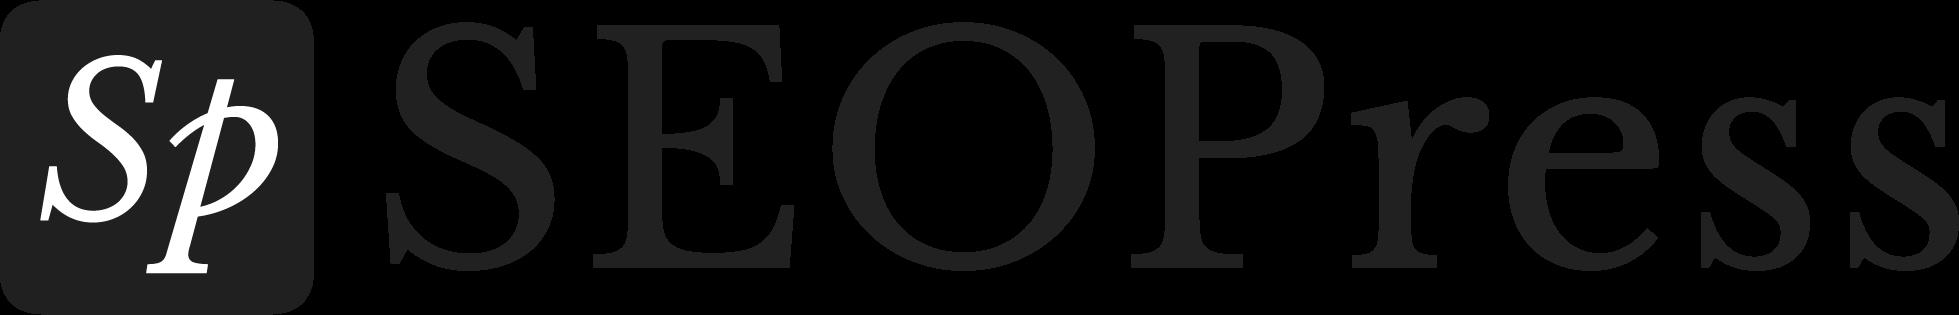 seopress-logo